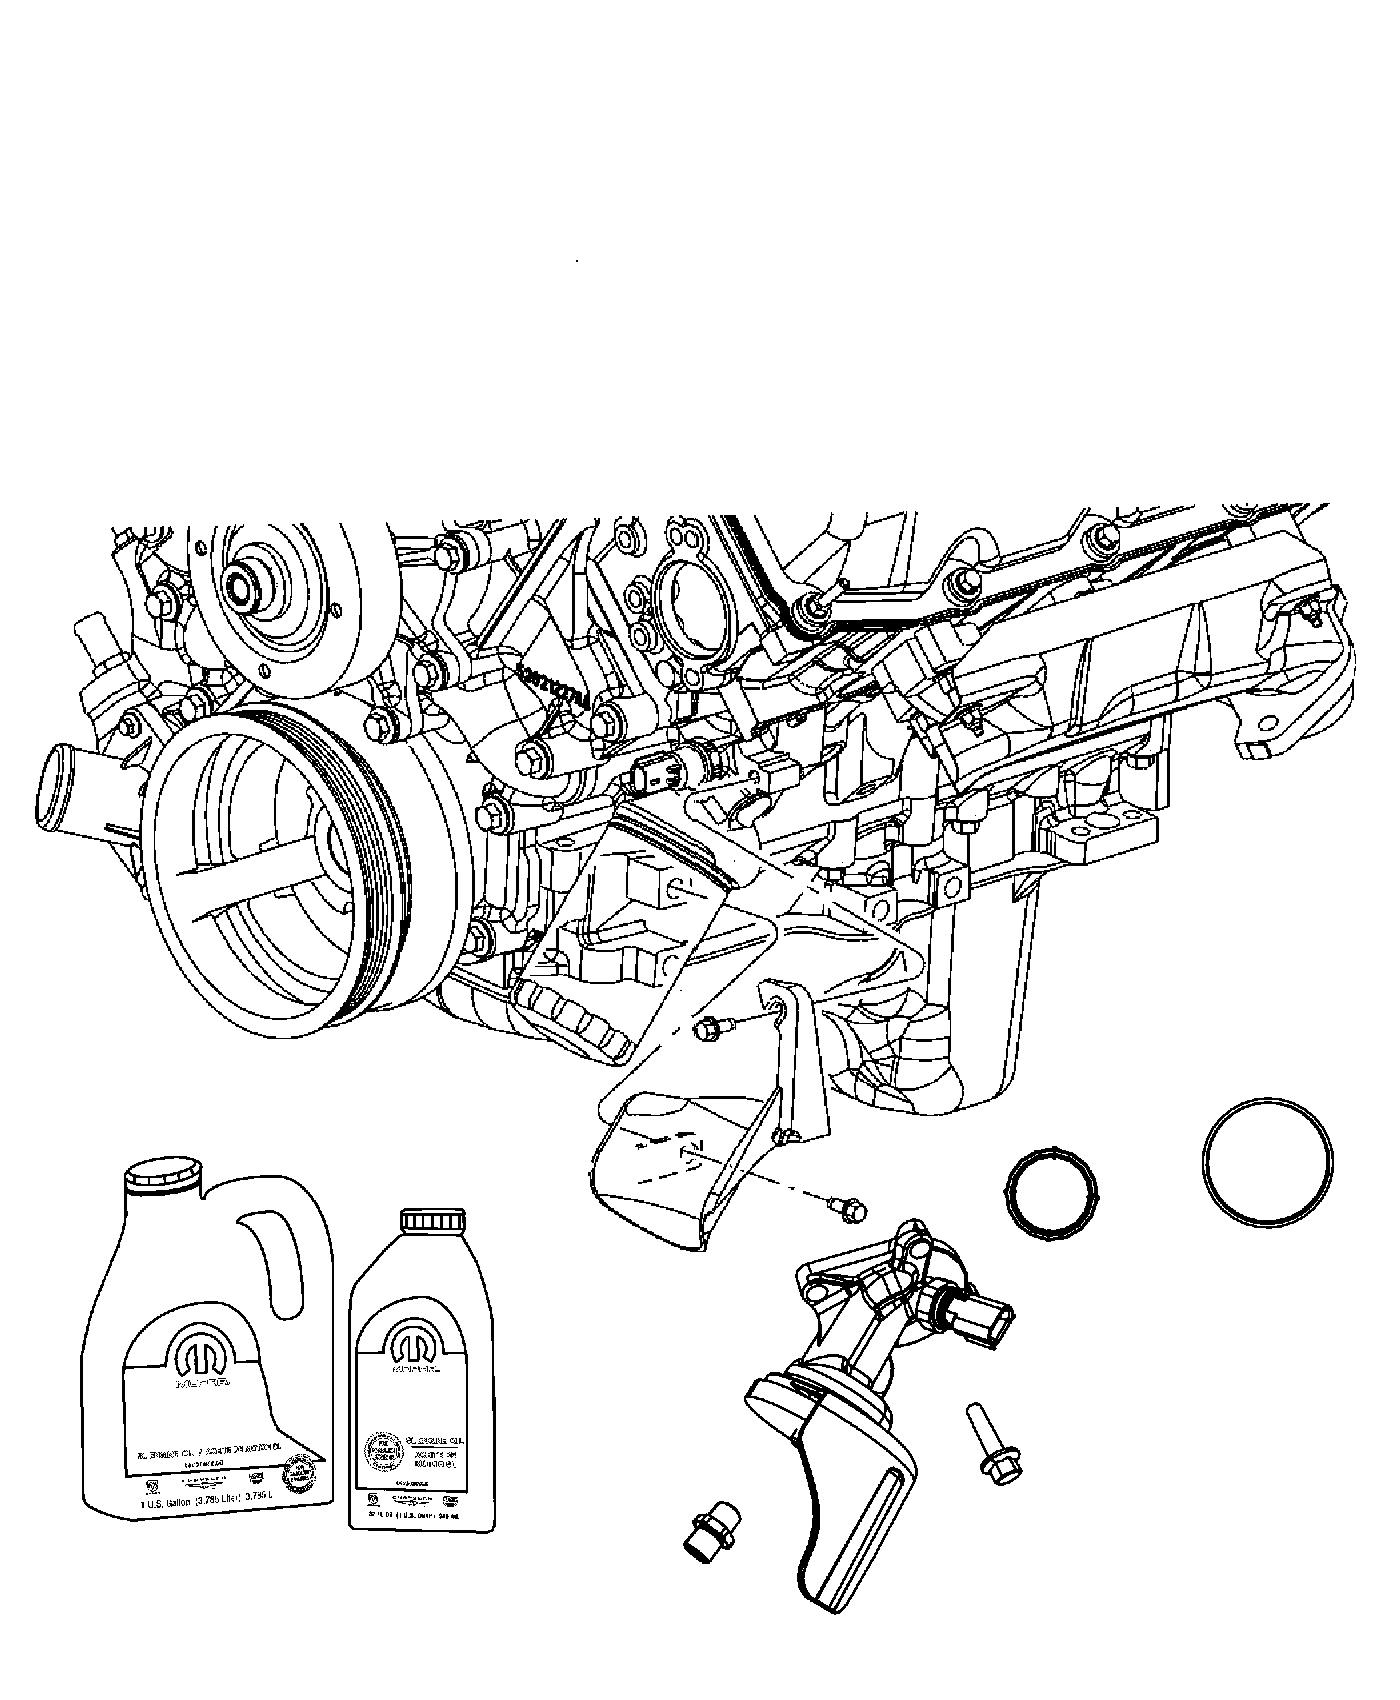 Jeep Commander Engine Oil Filter Adapter And Splash